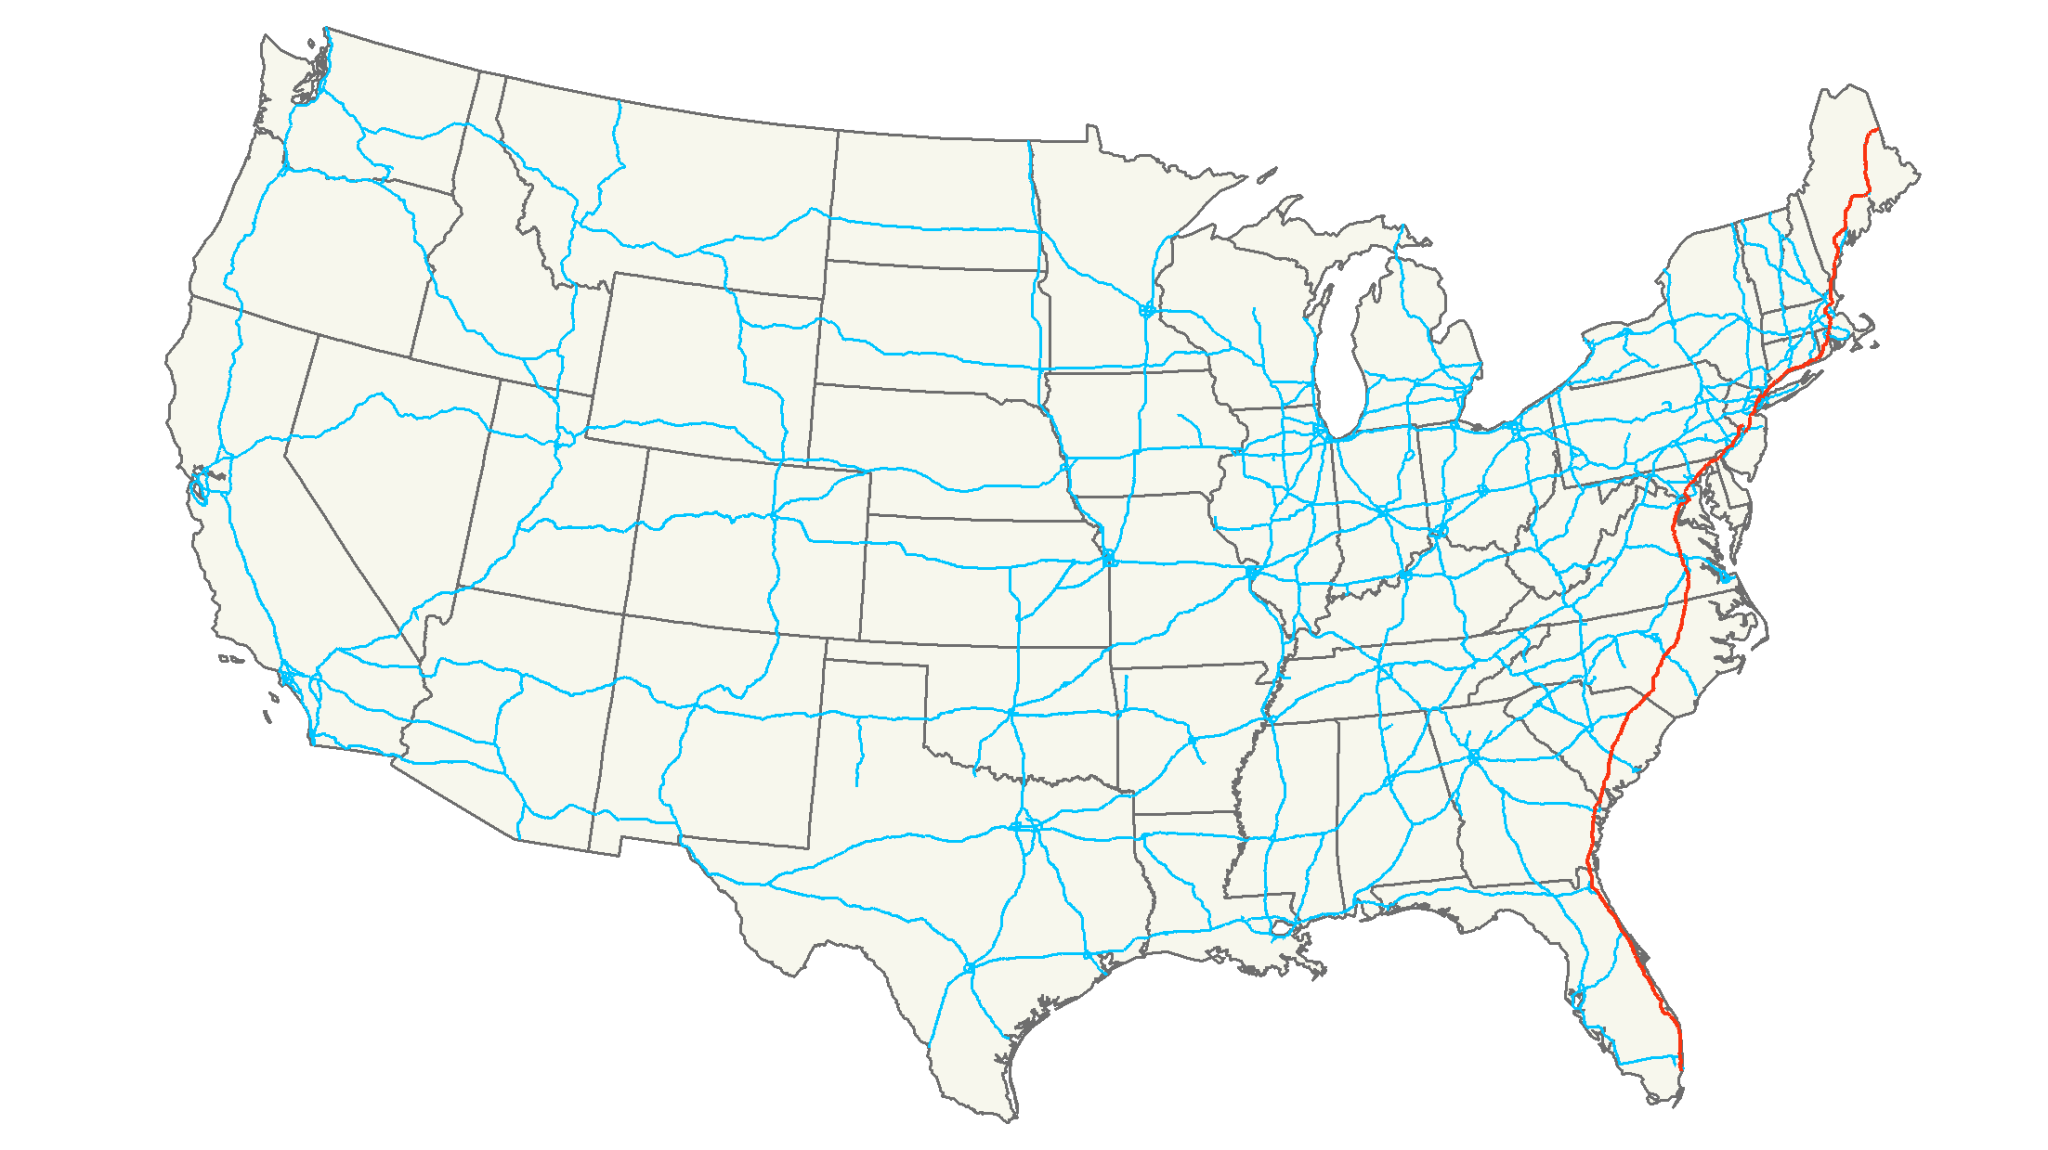 7 of the Longest US Interstates